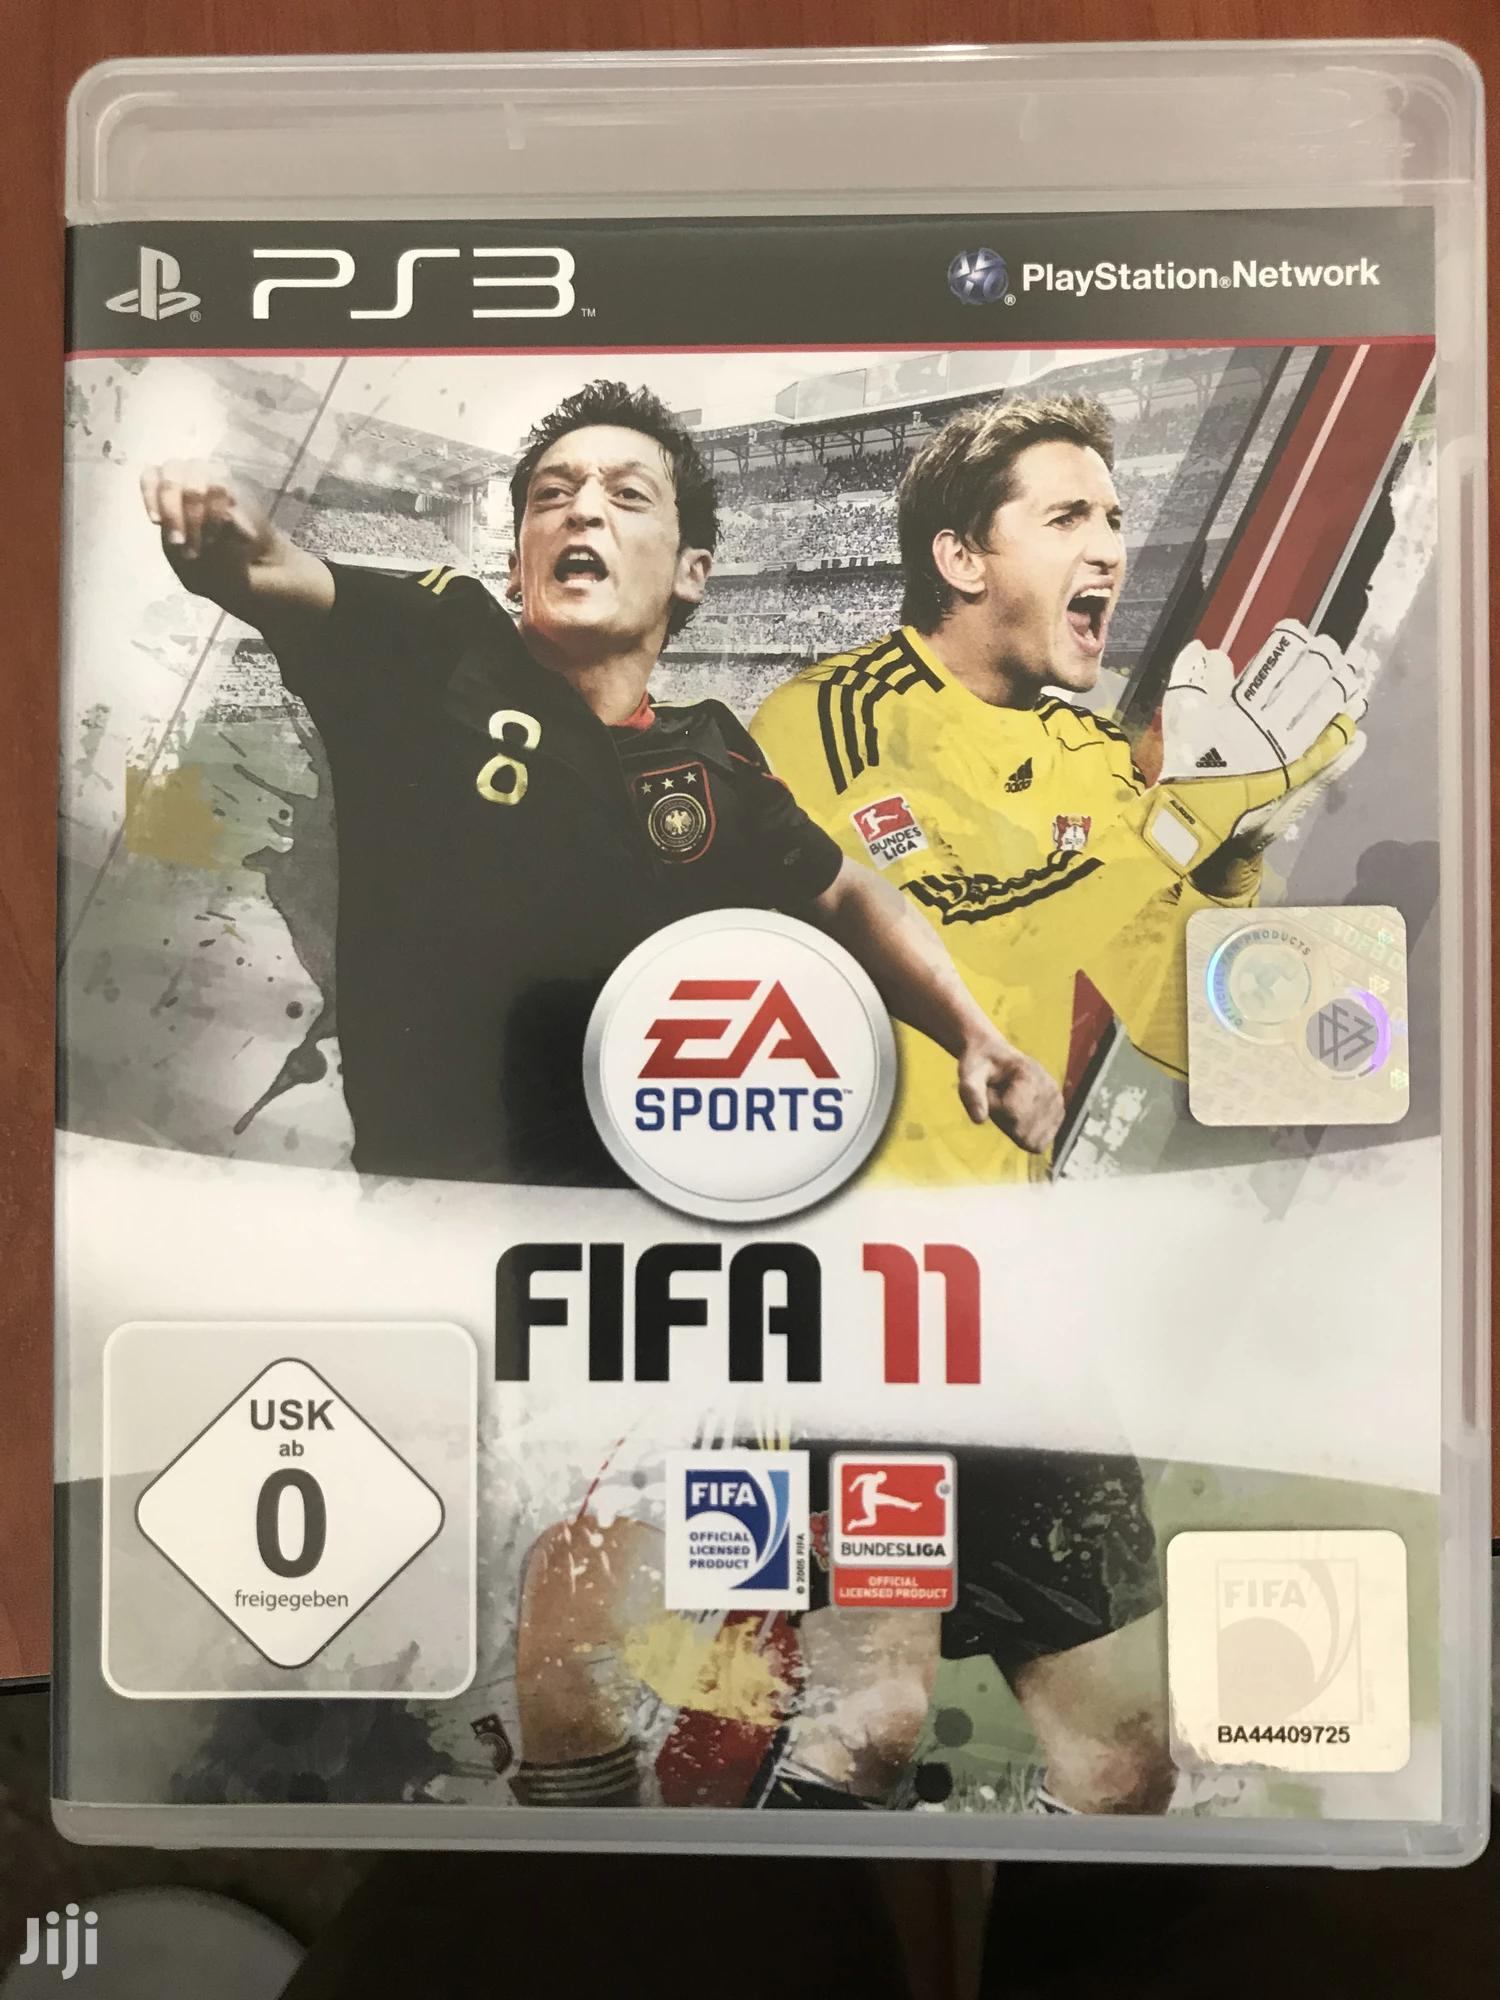 Ps3 Games (Fifa 10,11,12,13 & 14)   Video Games for sale in Arusha, Arusha Region, Tanzania